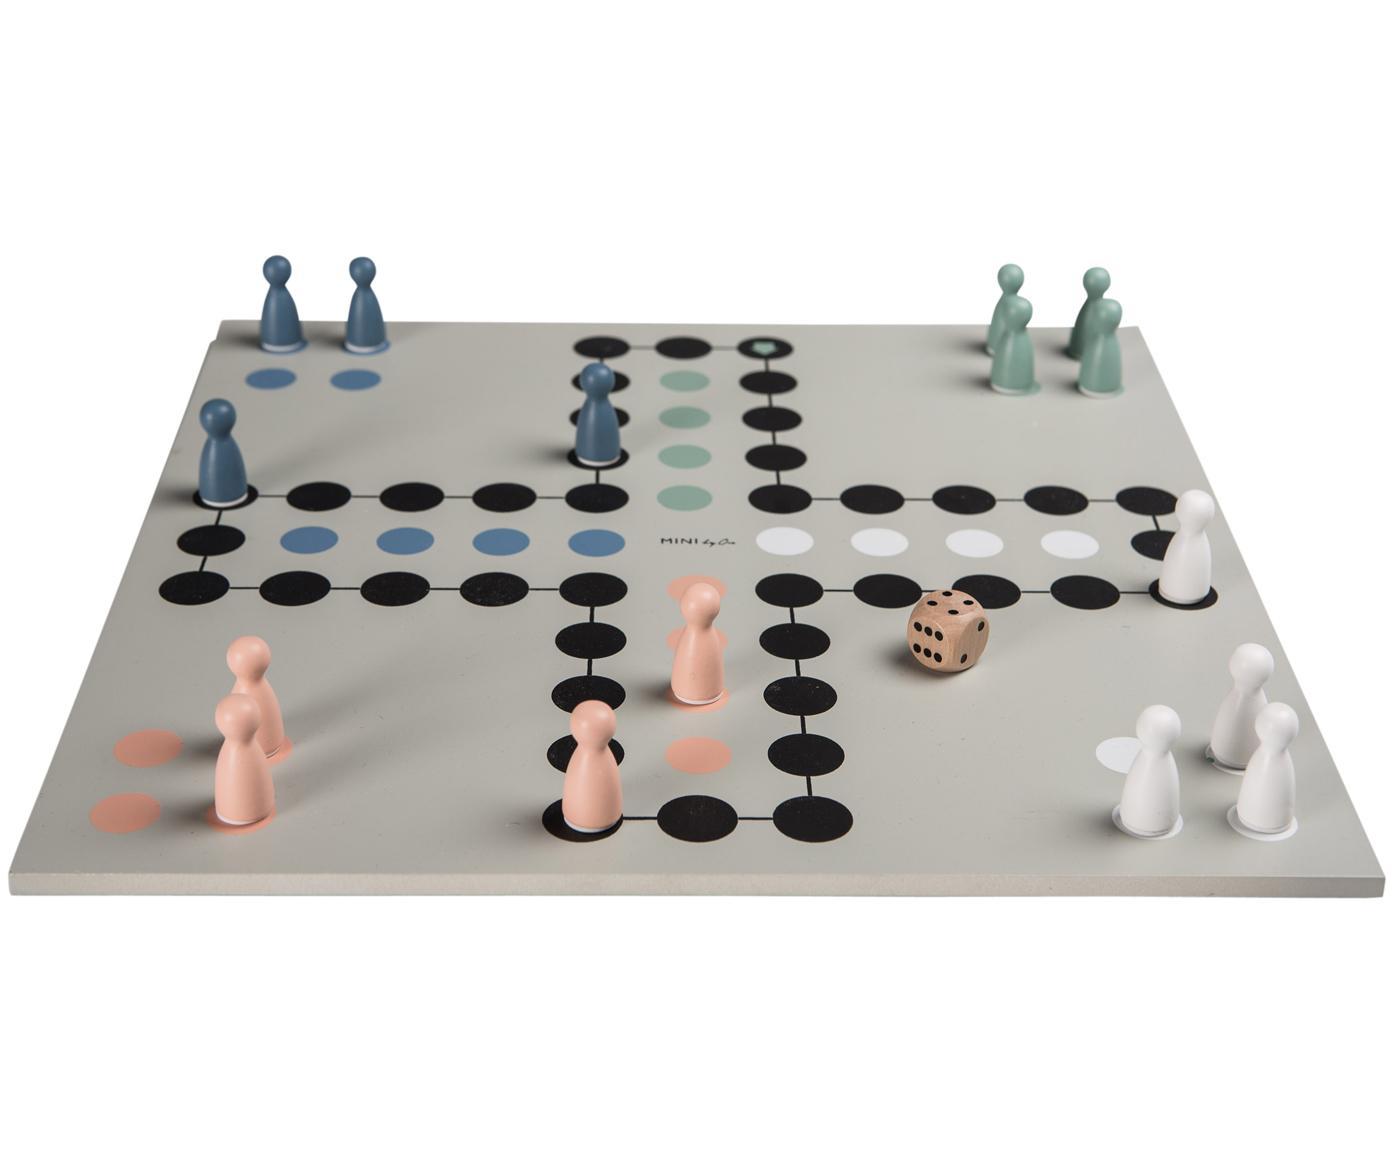 Gesellschaftsspiel Ludo Leona, Holz, lackiert, Grau, 30 x 30 cm